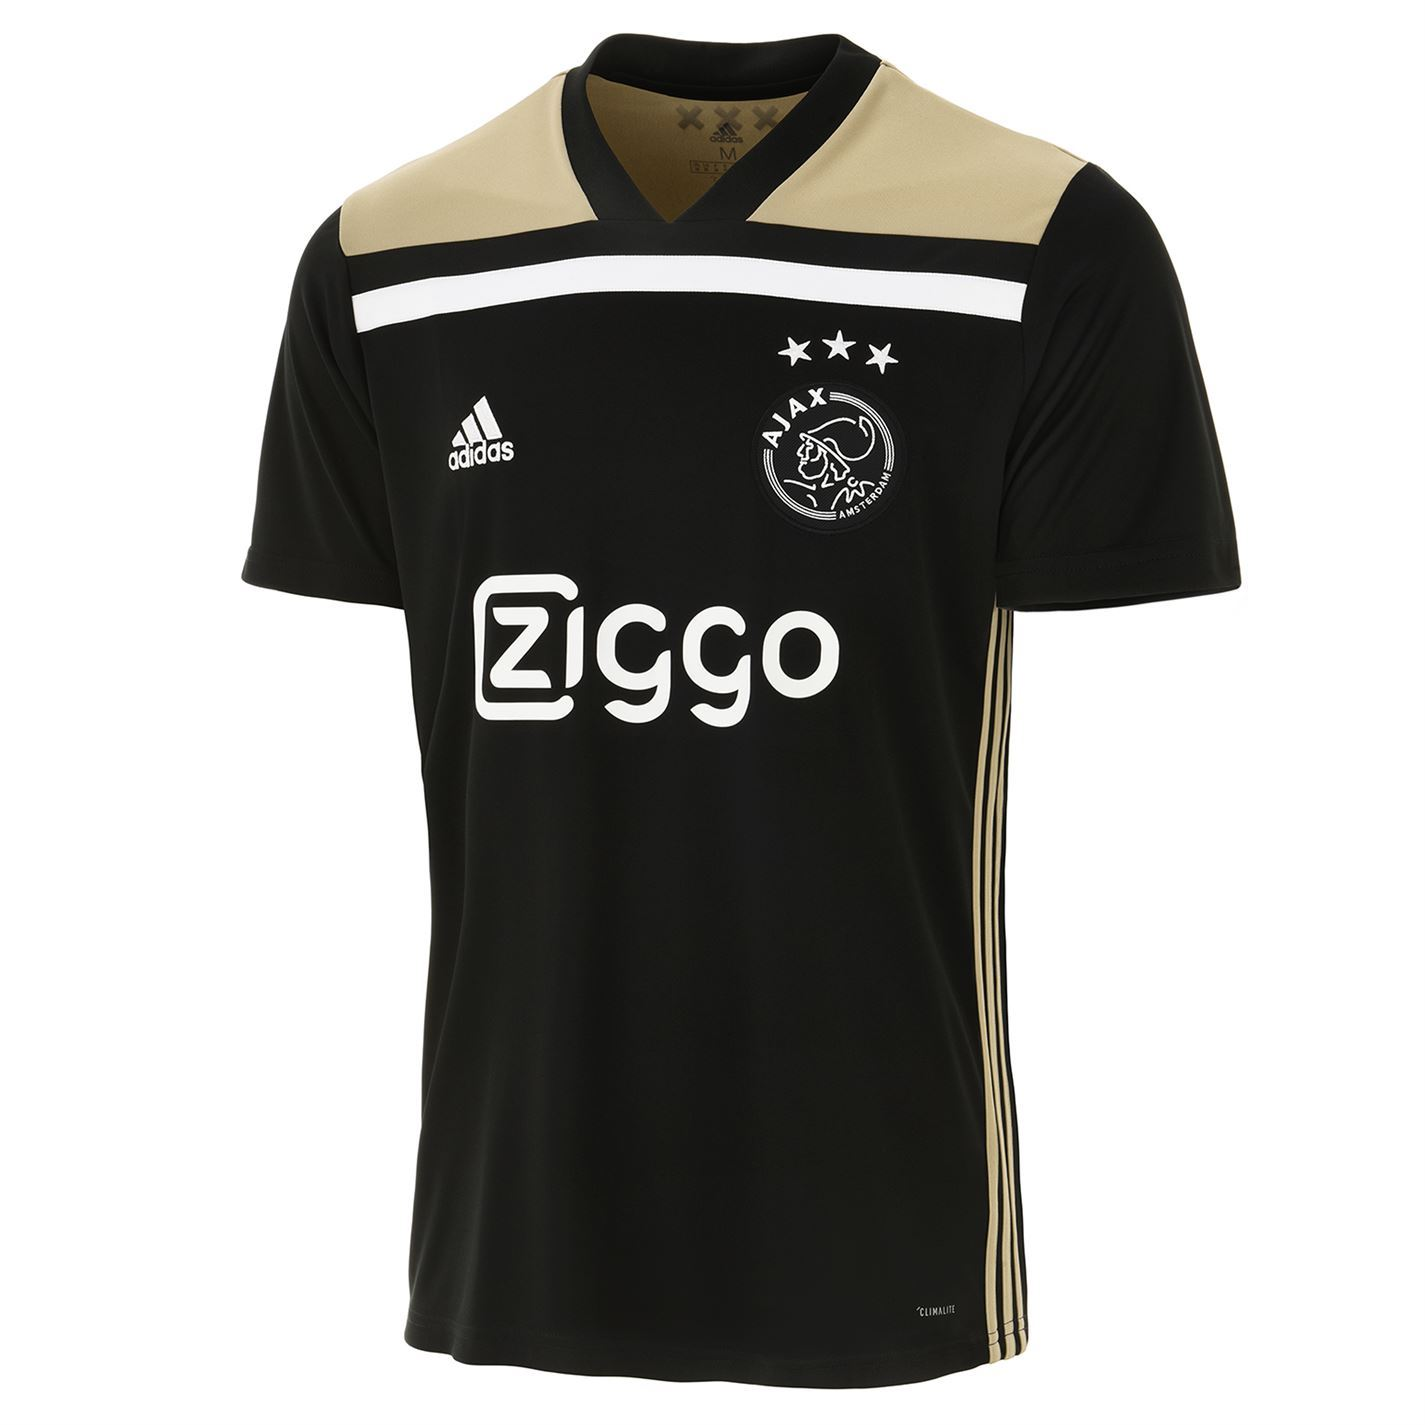 a8ff6f7b7 ... adidas Ajax Away Jersey 2018 2019 Mens Black Gold Football Soccer Fan  Shirt Top ...